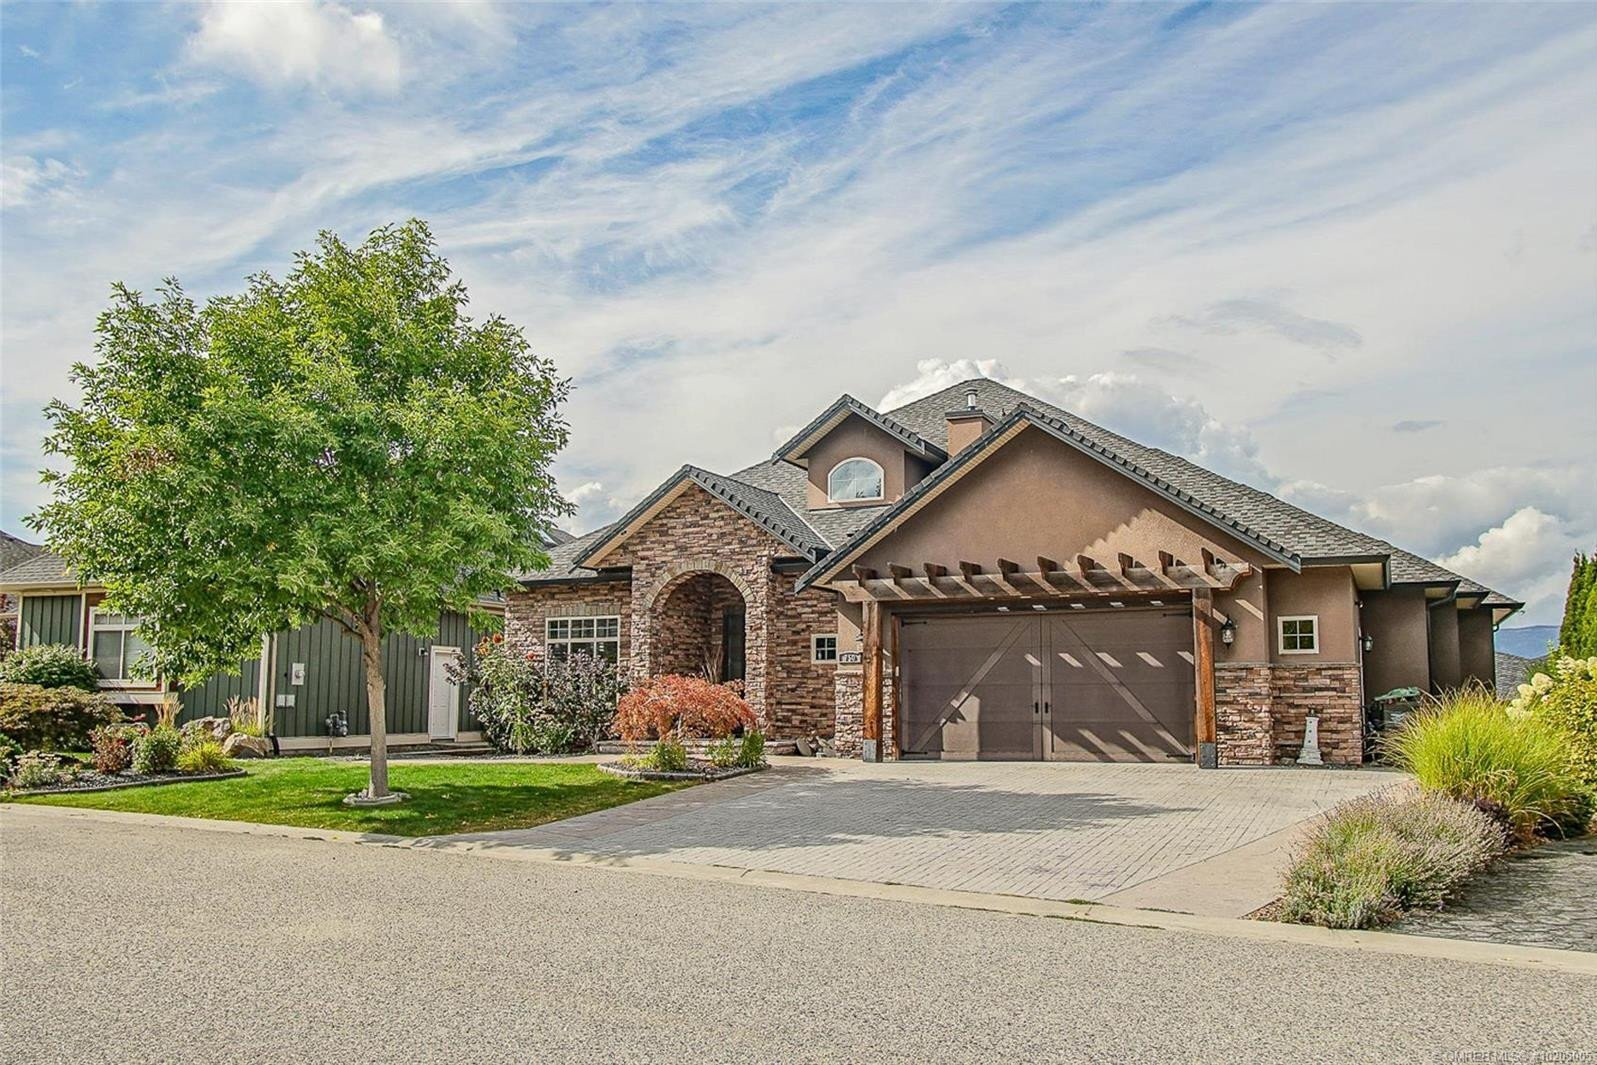 House for sale at 750 Marin Cres Kelowna British Columbia - MLS: 10205005